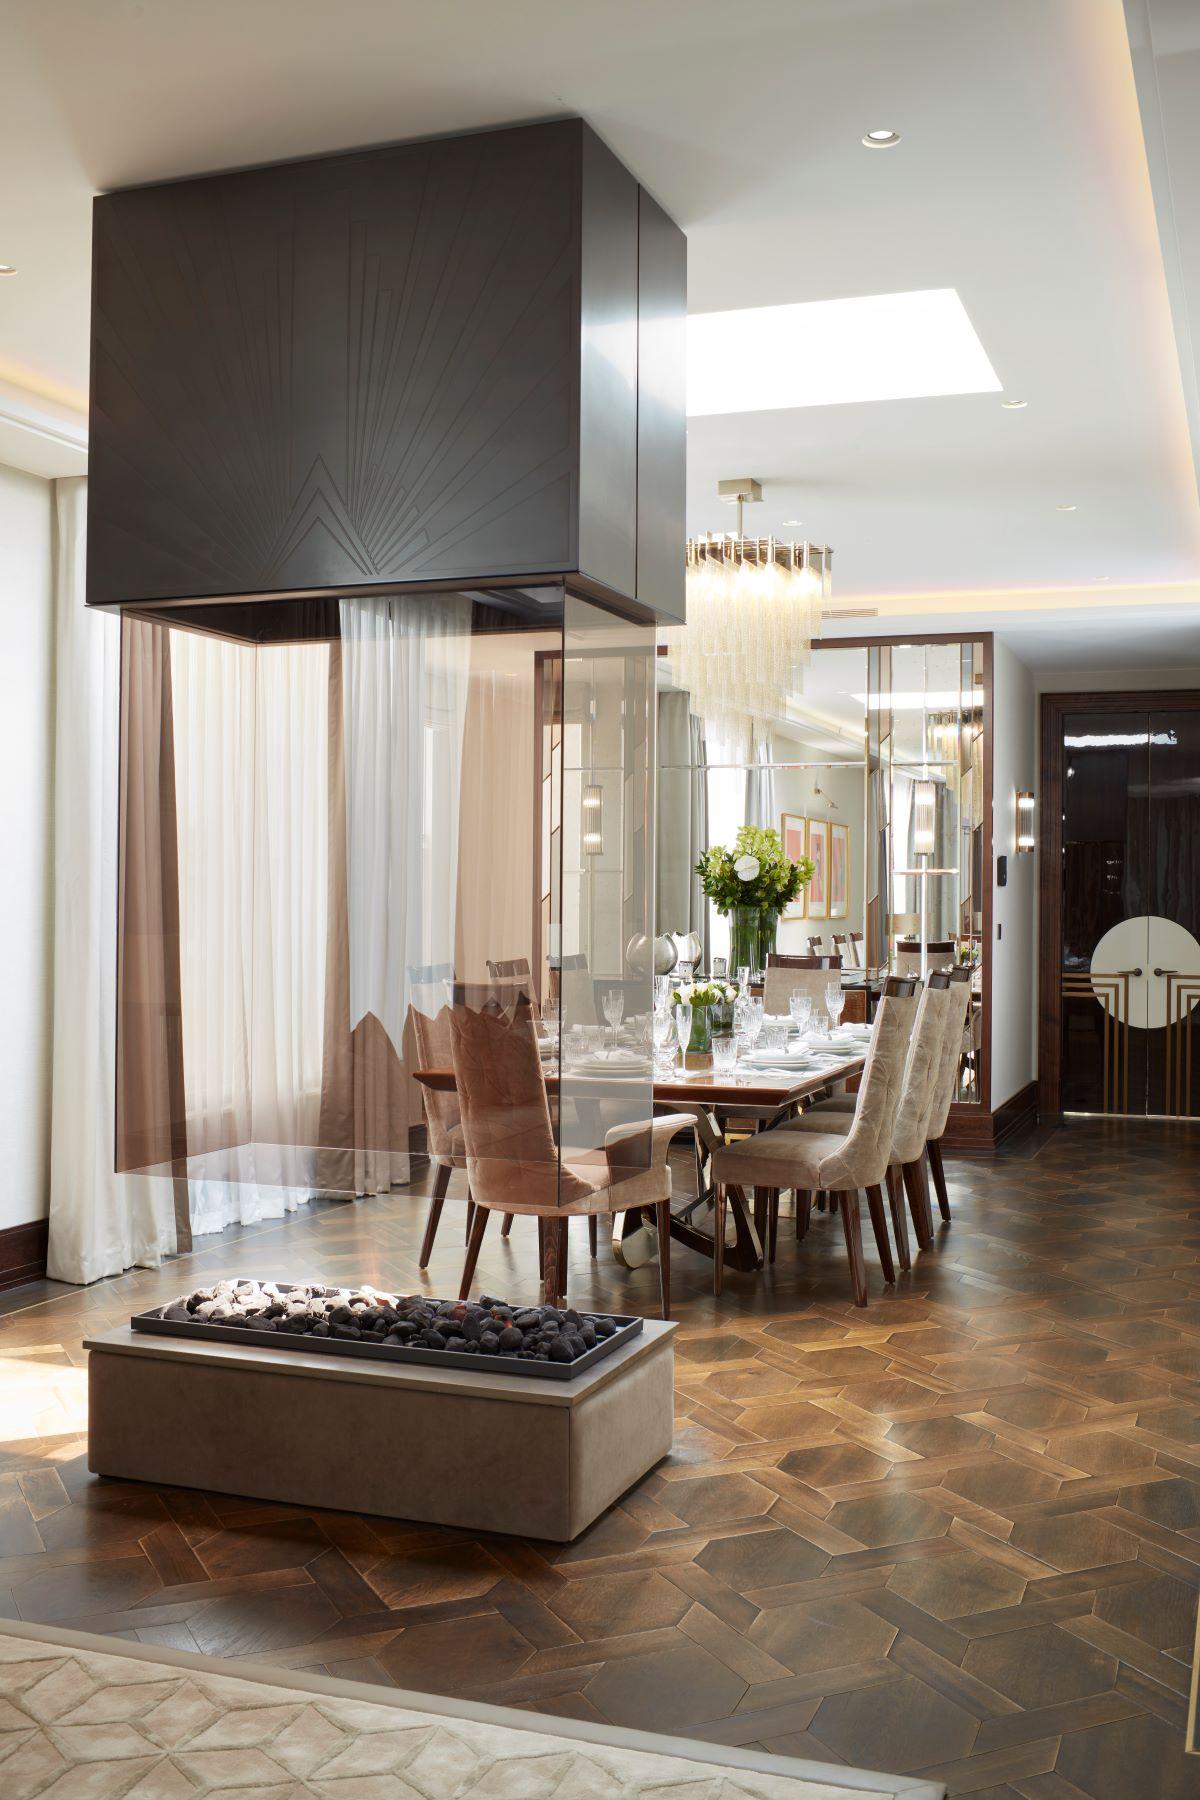 Additional photo for property listing at London, England United Kingdom